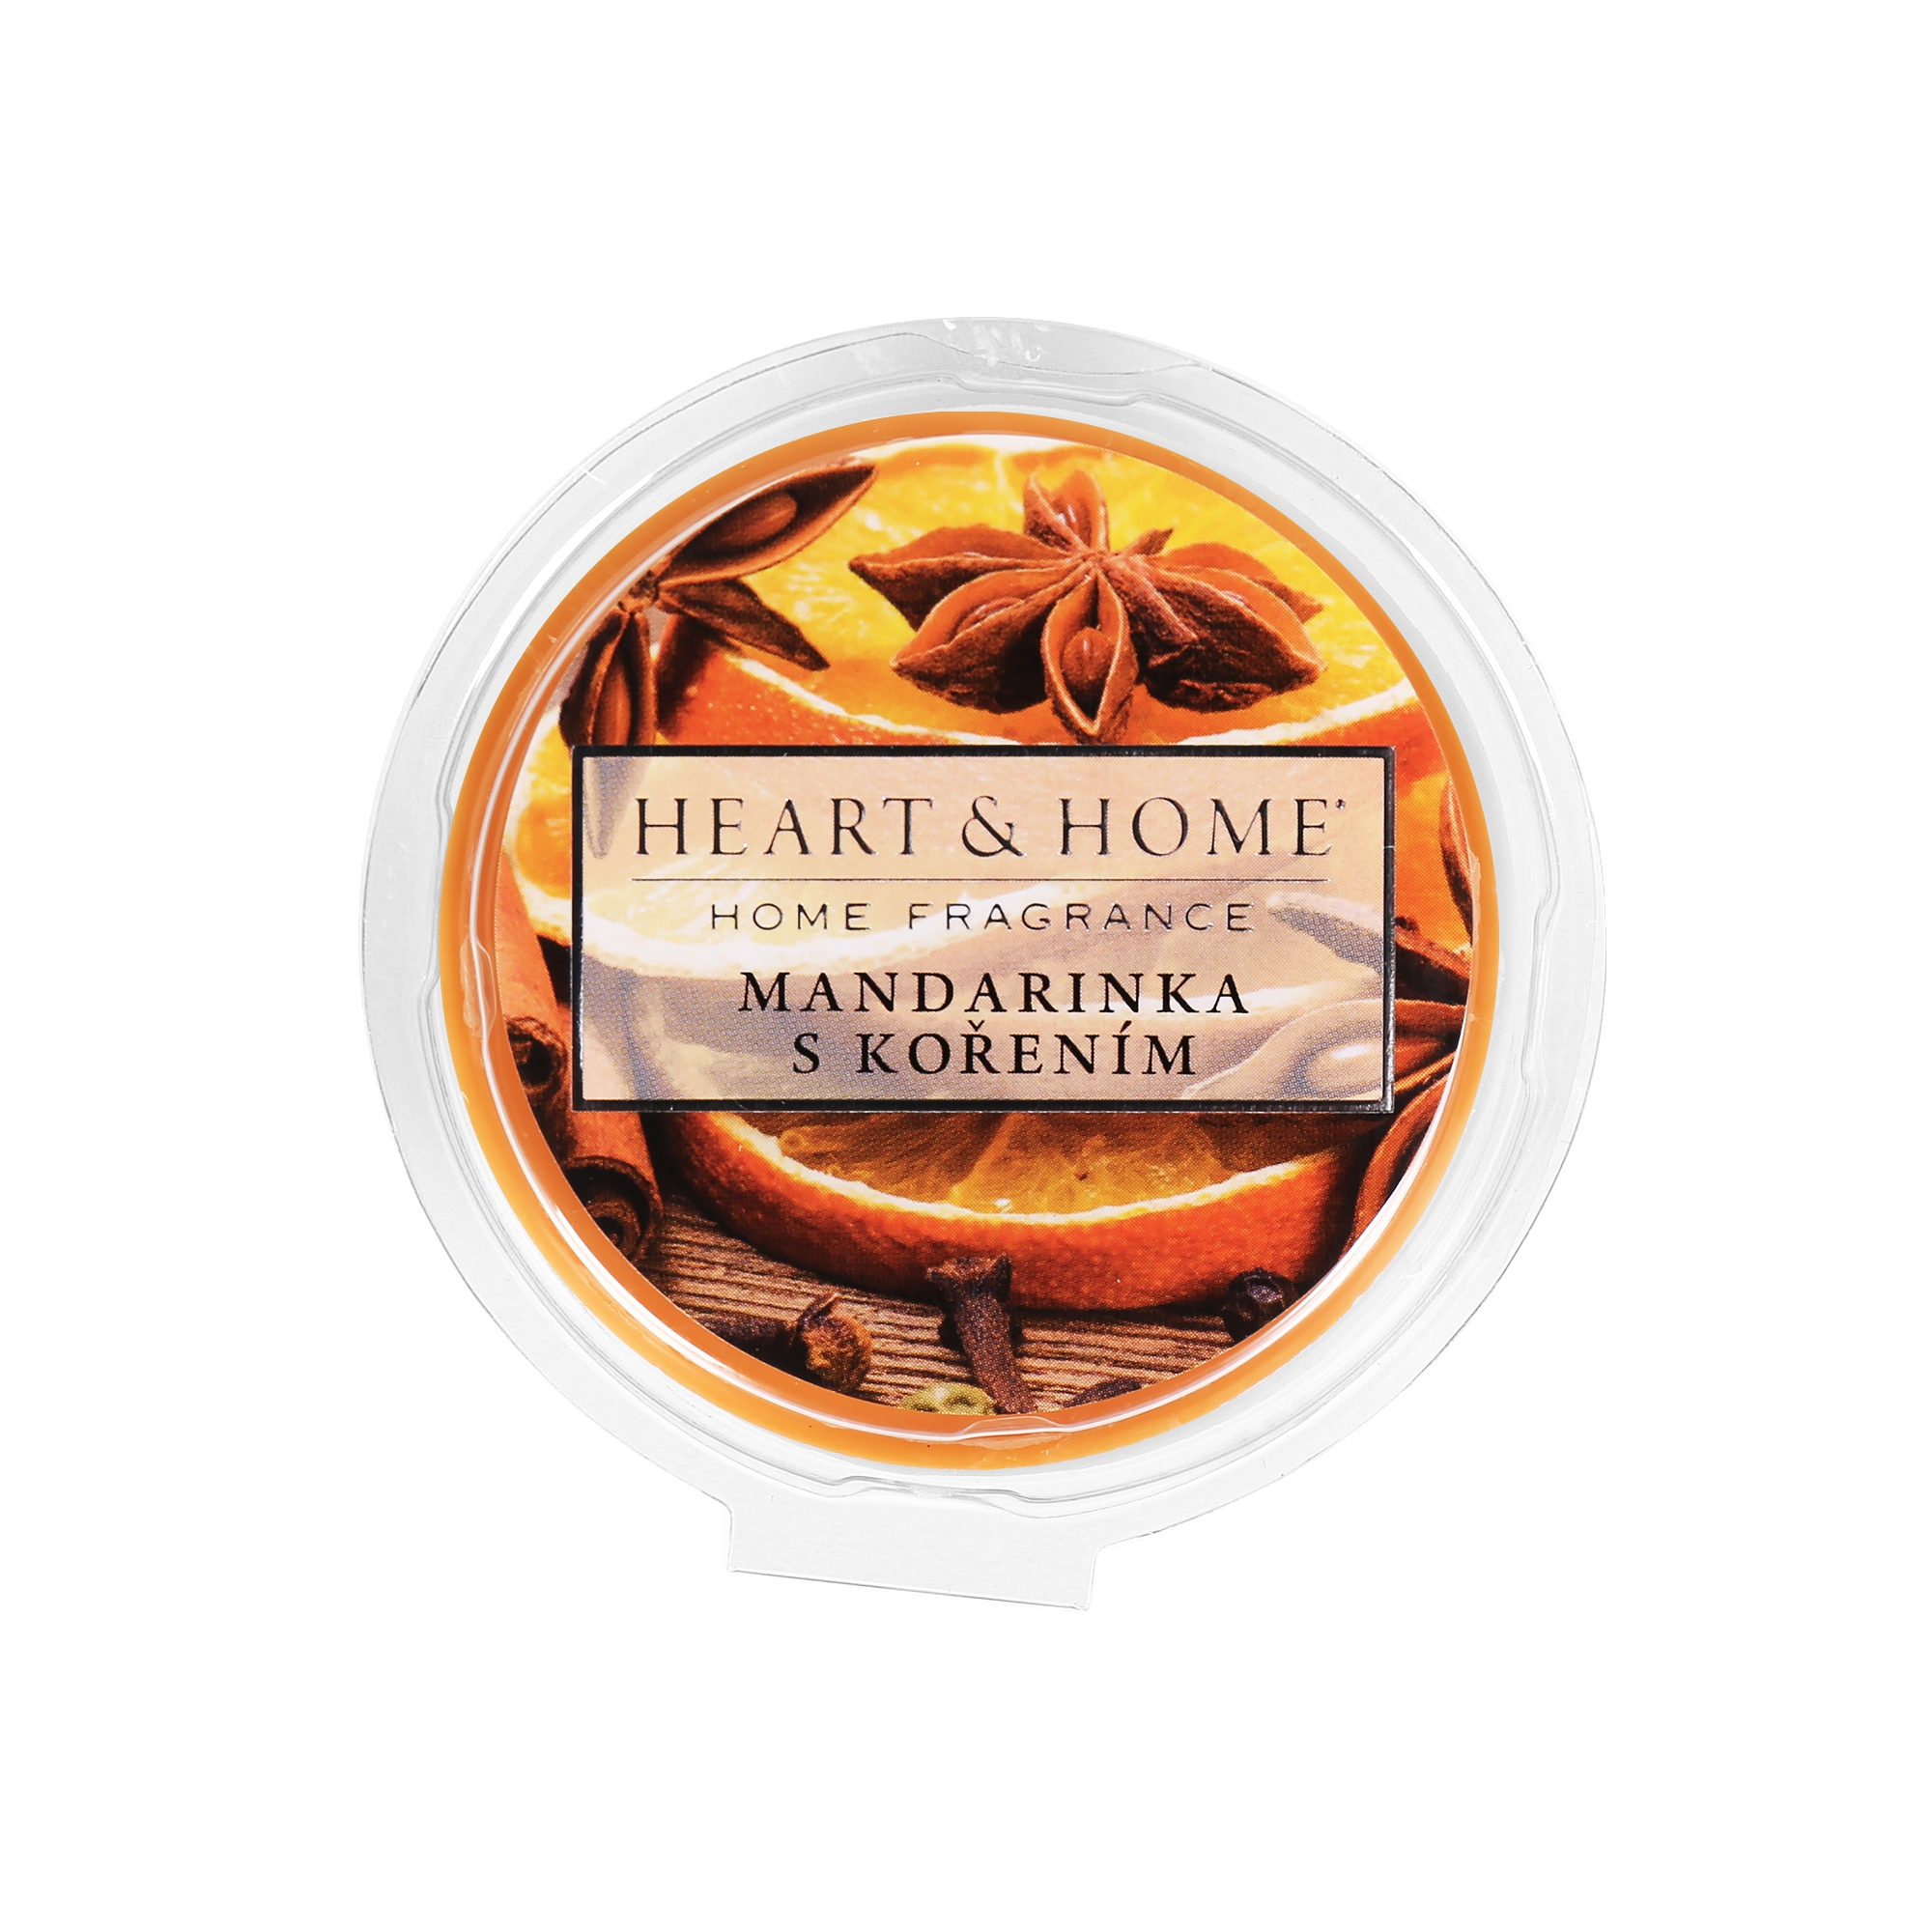 Vonné vosky - Vonný vosk - Mandarinka s kořením